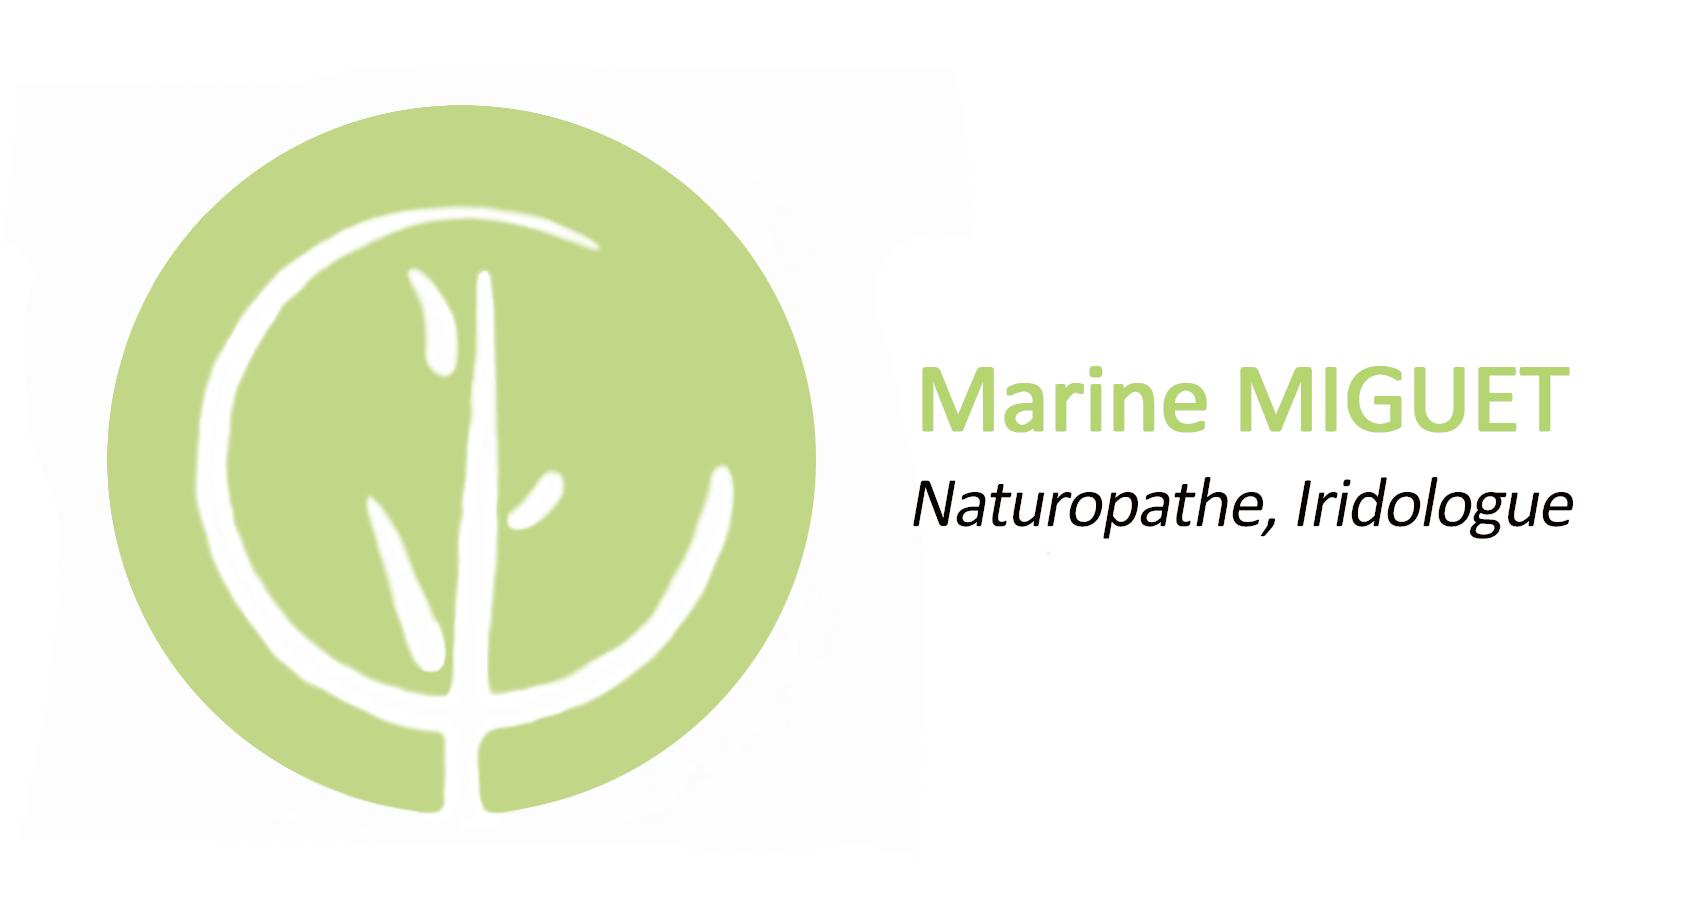 Marine MIGUET Naturopathe